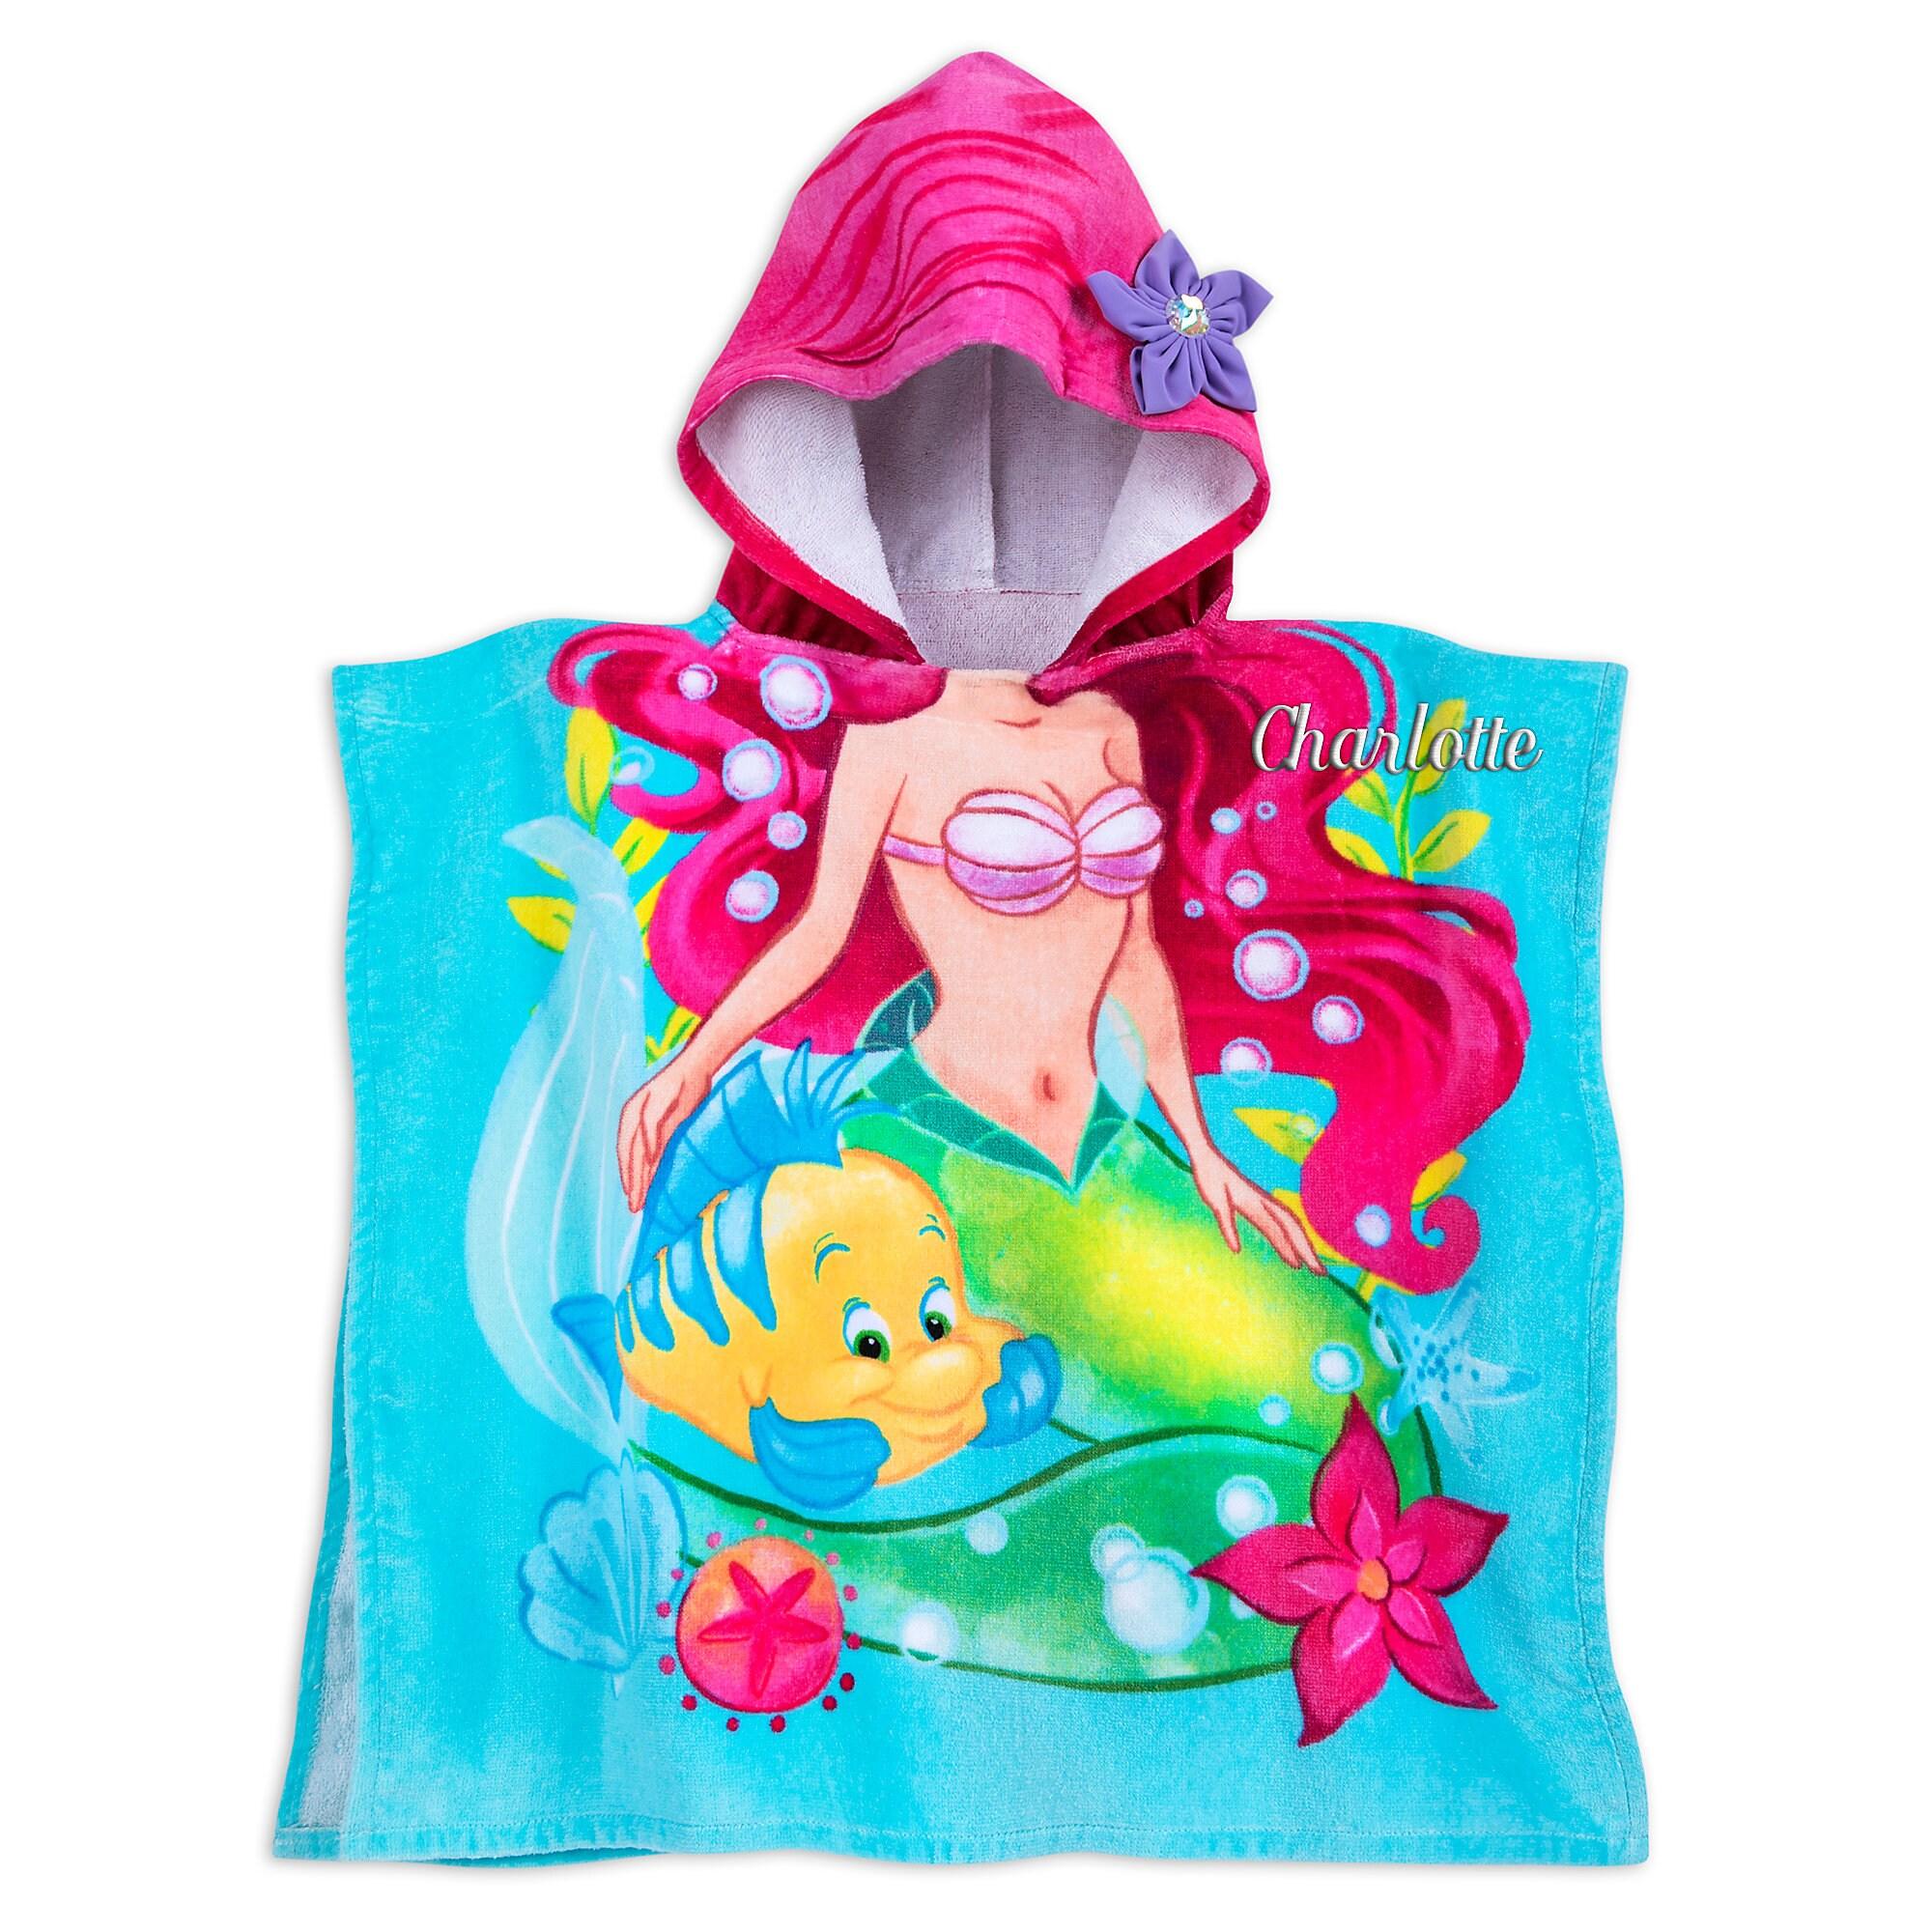 Ariel Hooded Towel for Kids - Personalizable